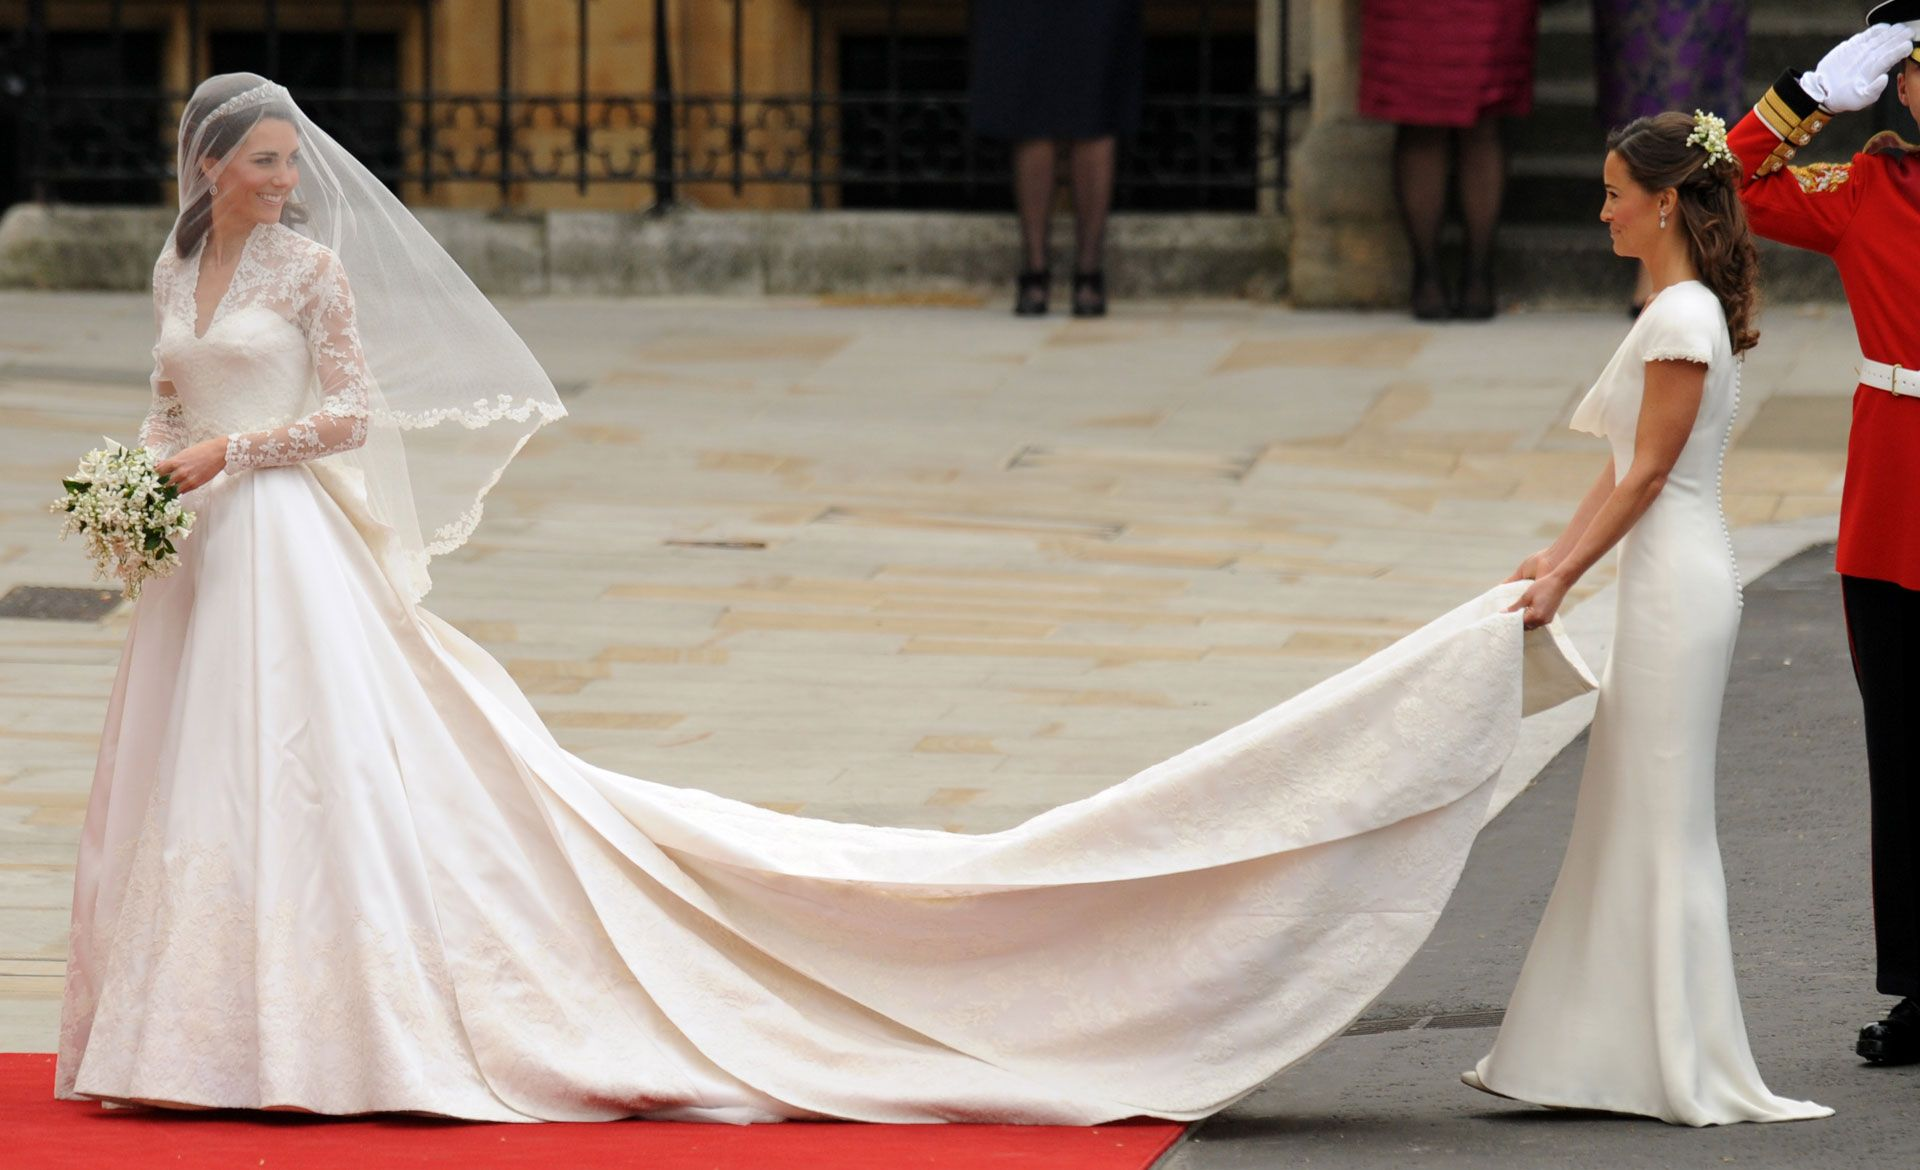 Wedding Dress Not Be Worn